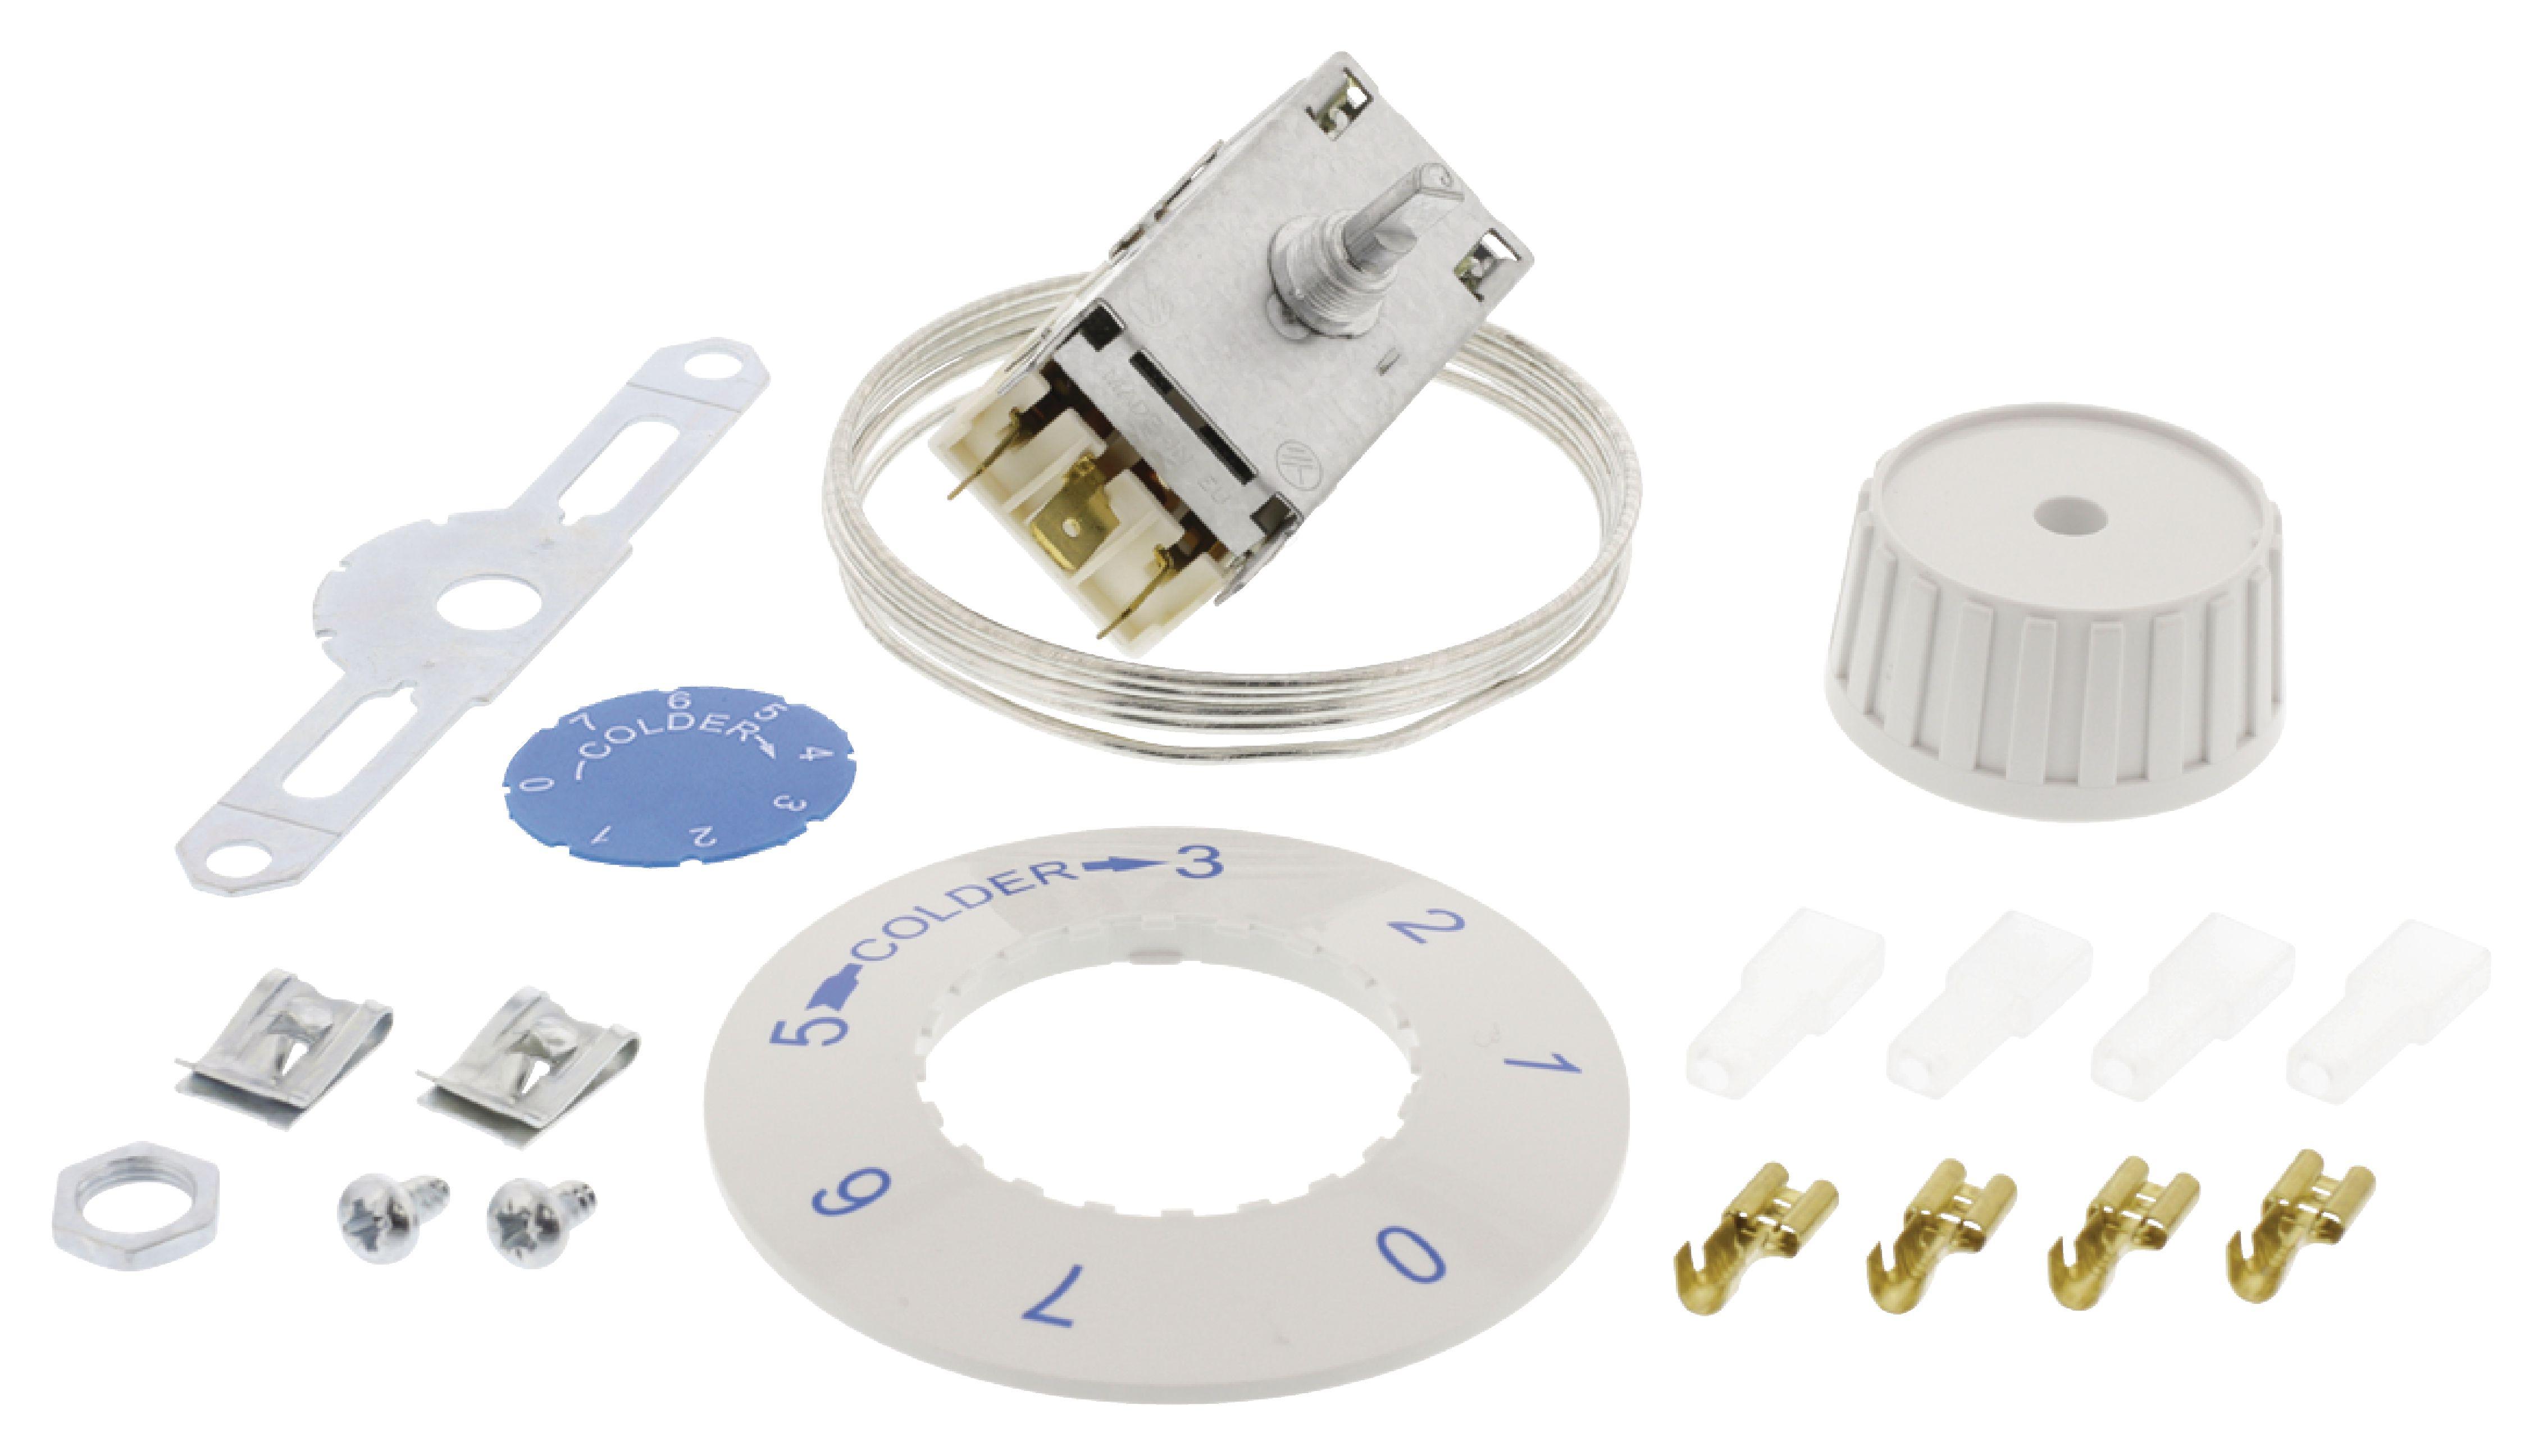 Termostat pro lednice VT9 Whirlpool 484000008683